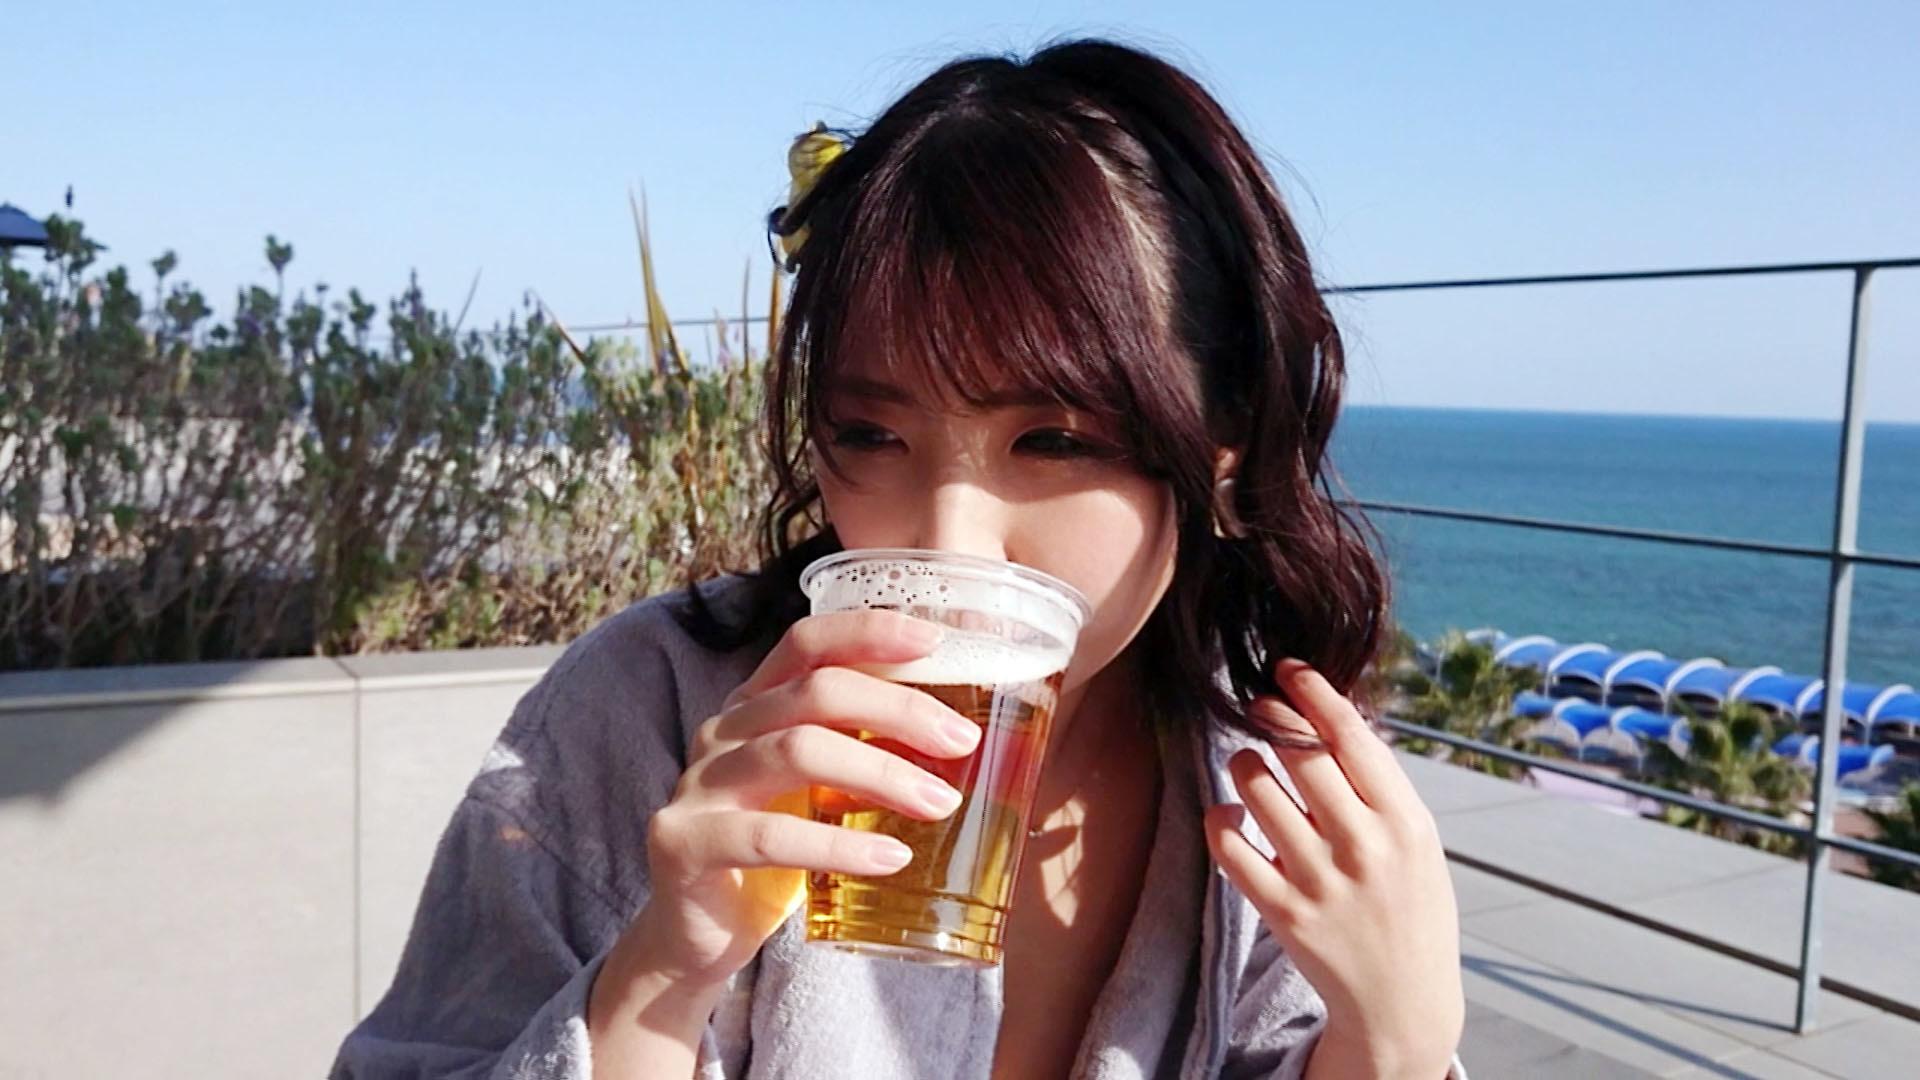 Gカップ美女と子作り旅 しおんchan 生中大好きビッチと子作り旅 りりあchan